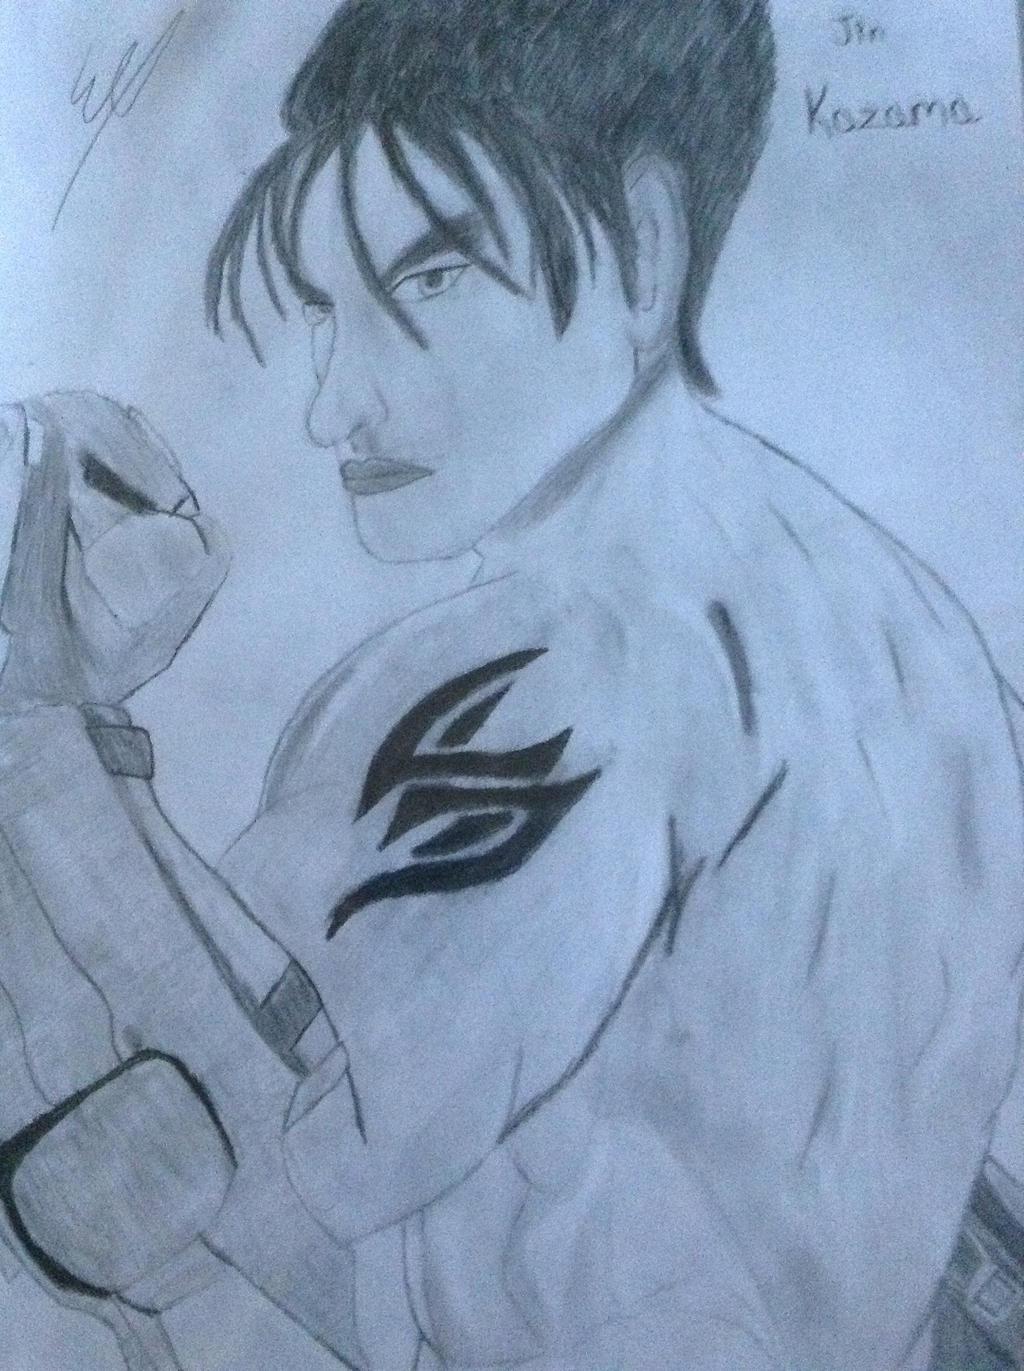 Jin Kazama // Tekken by SweetScarletSky